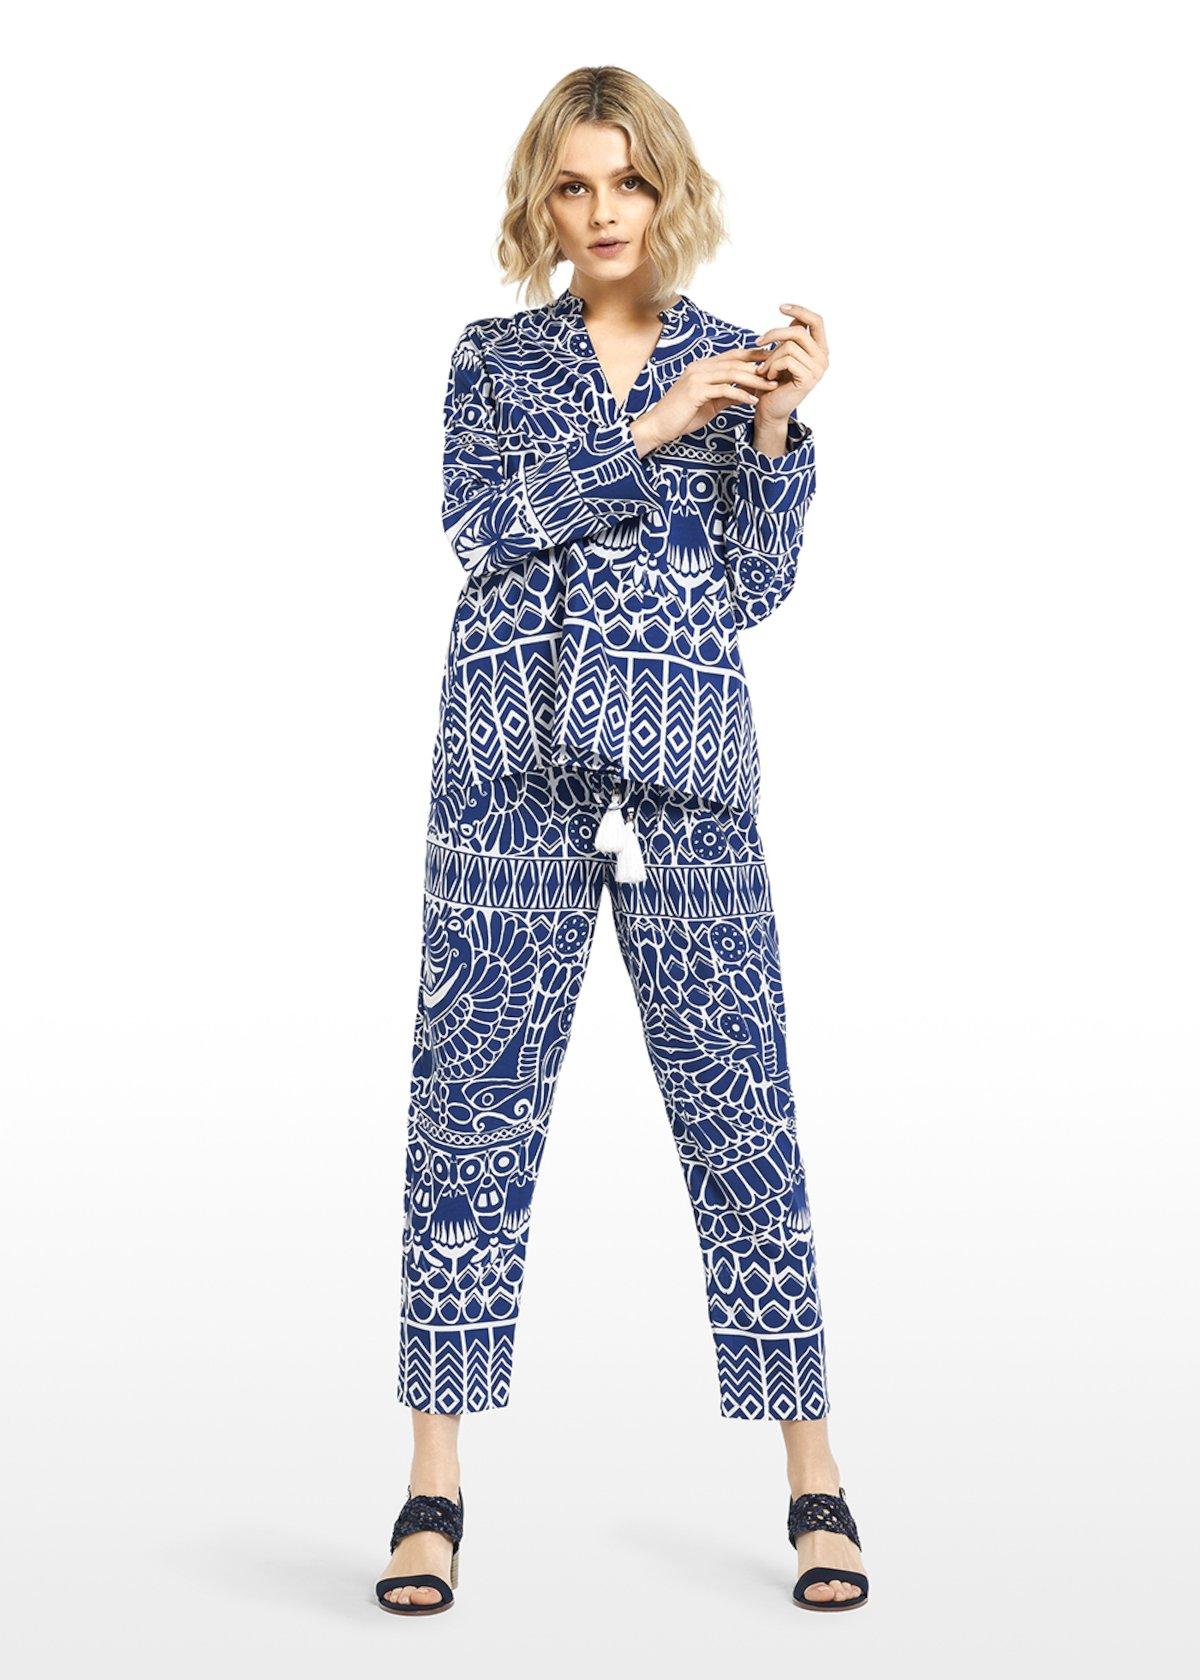 All over printed Platon trousers with drawstring - Lapis\ White\ Fantasia - Woman